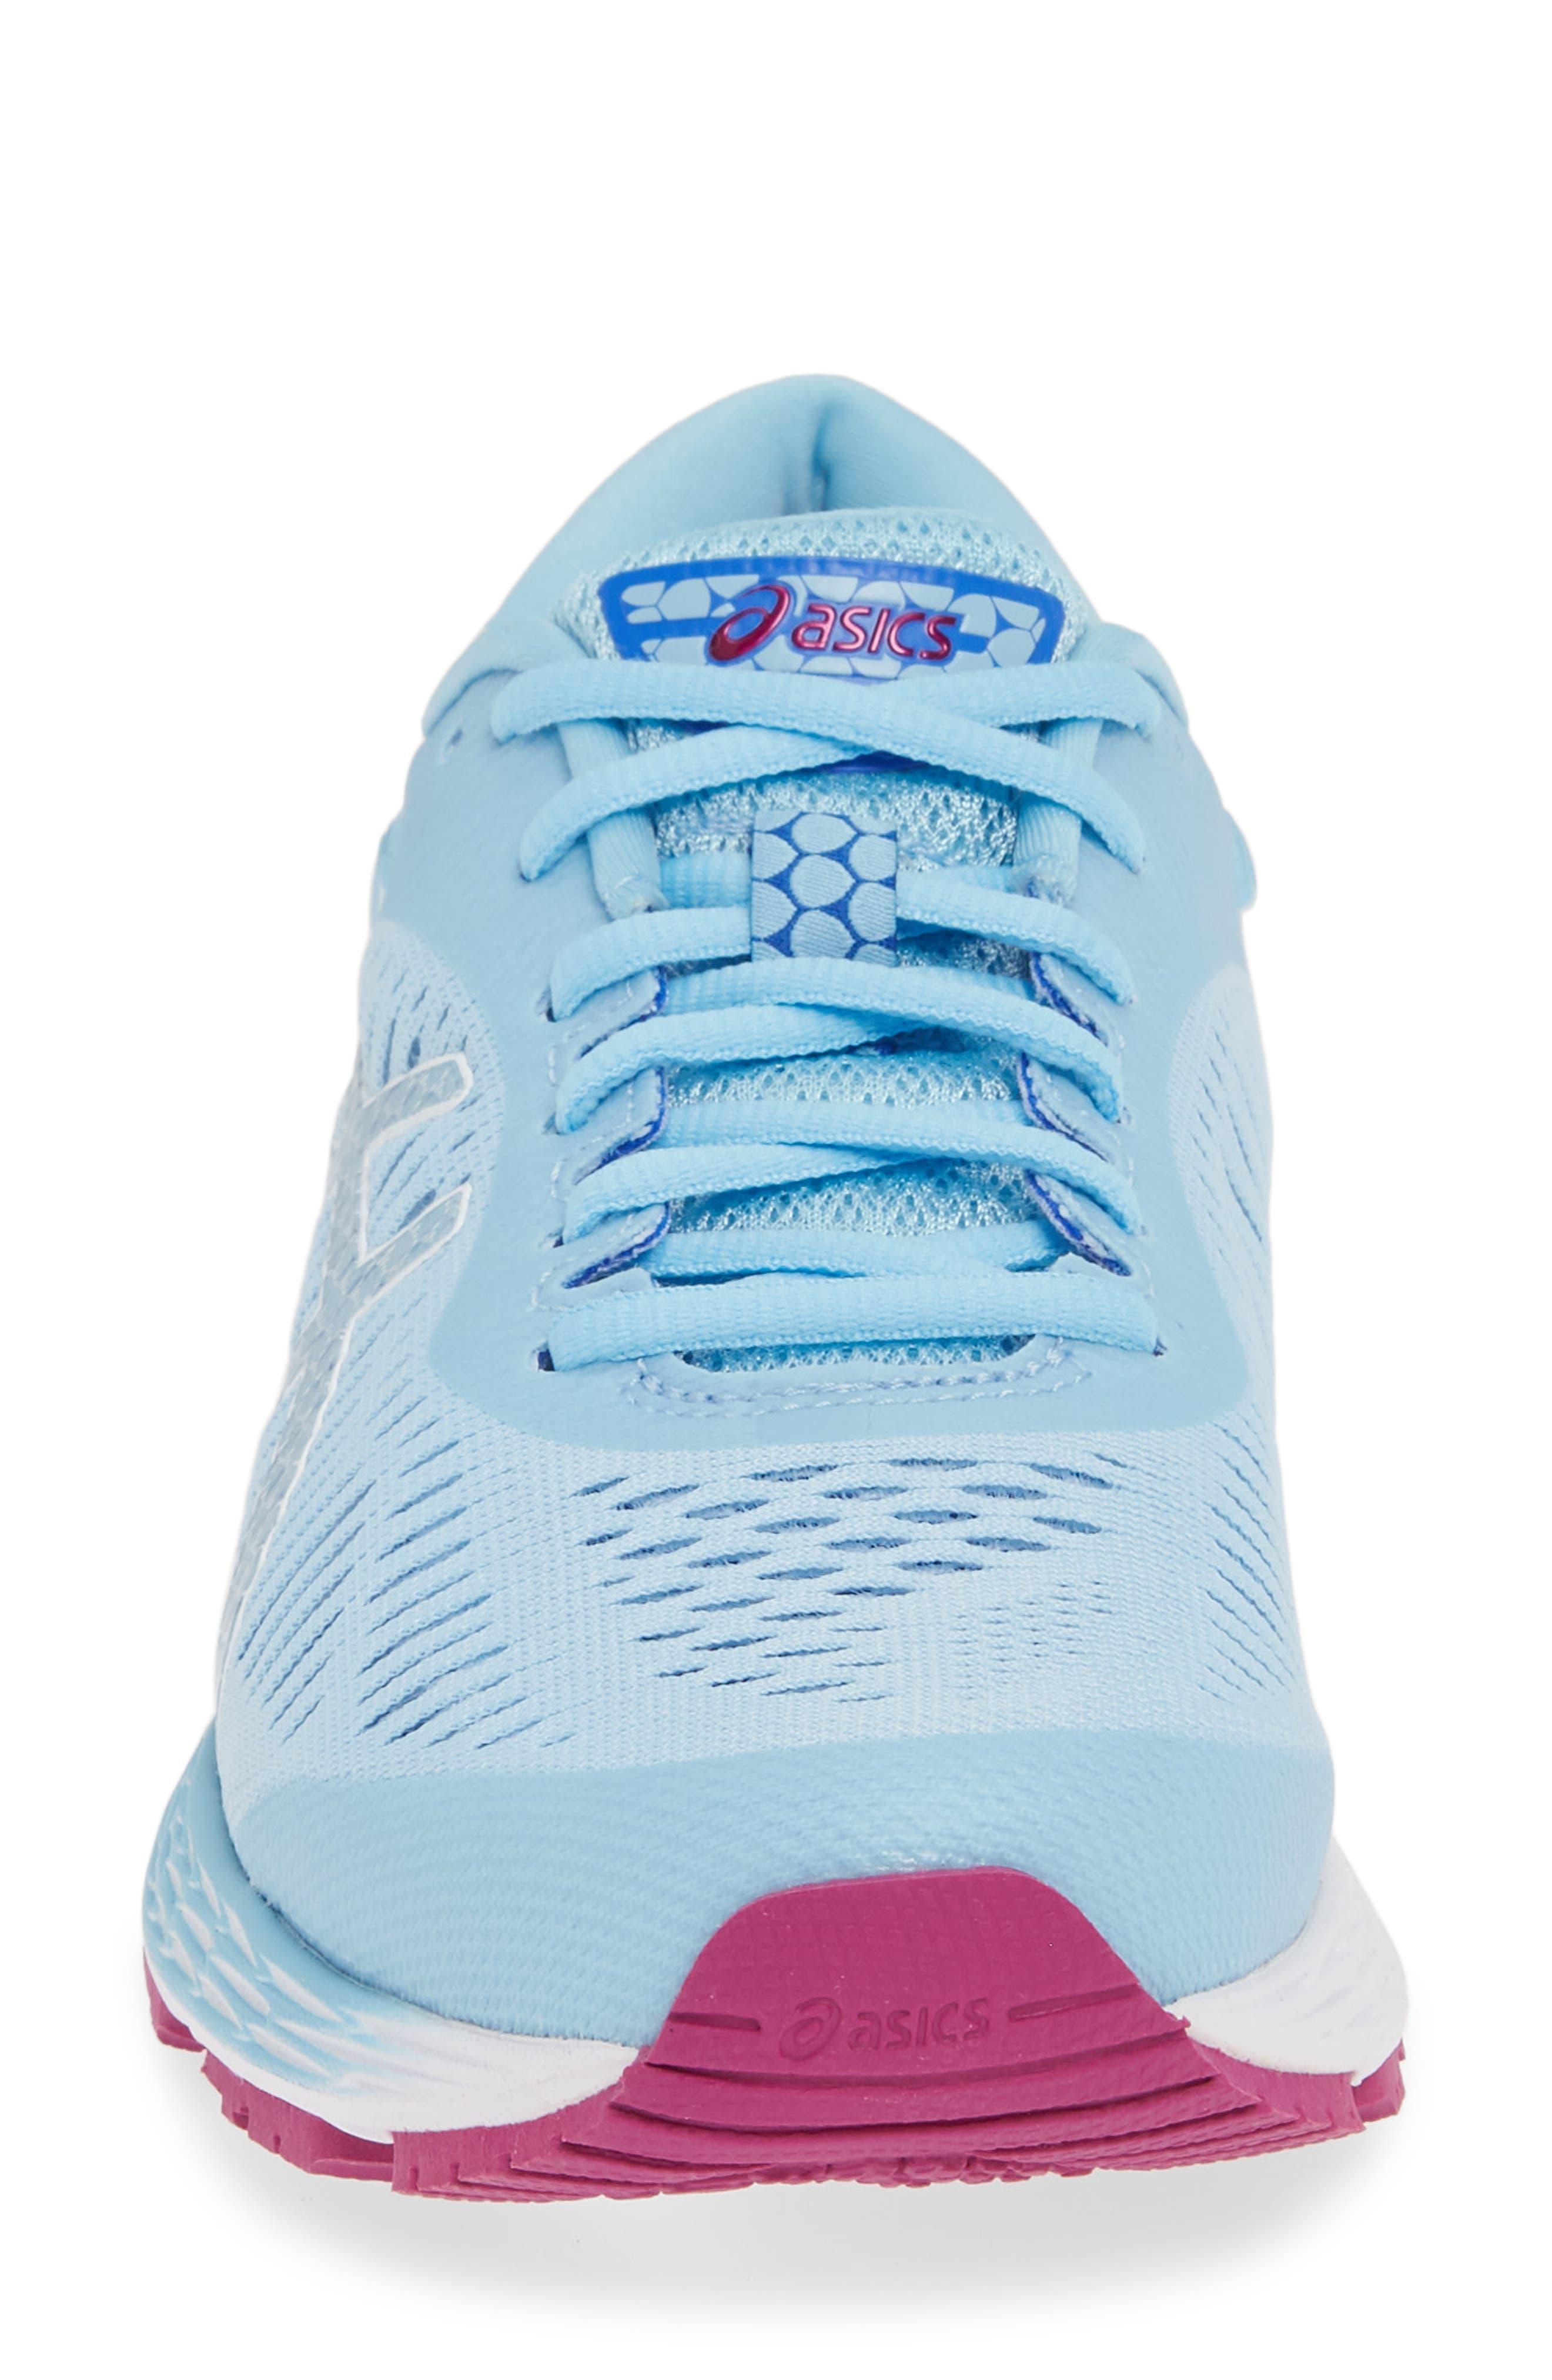 GEL-Kayano<sup>®</sup> 25 Running Shoe,                             Alternate thumbnail 4, color,                             SKYLIGHT/ ILLUSION BLUE